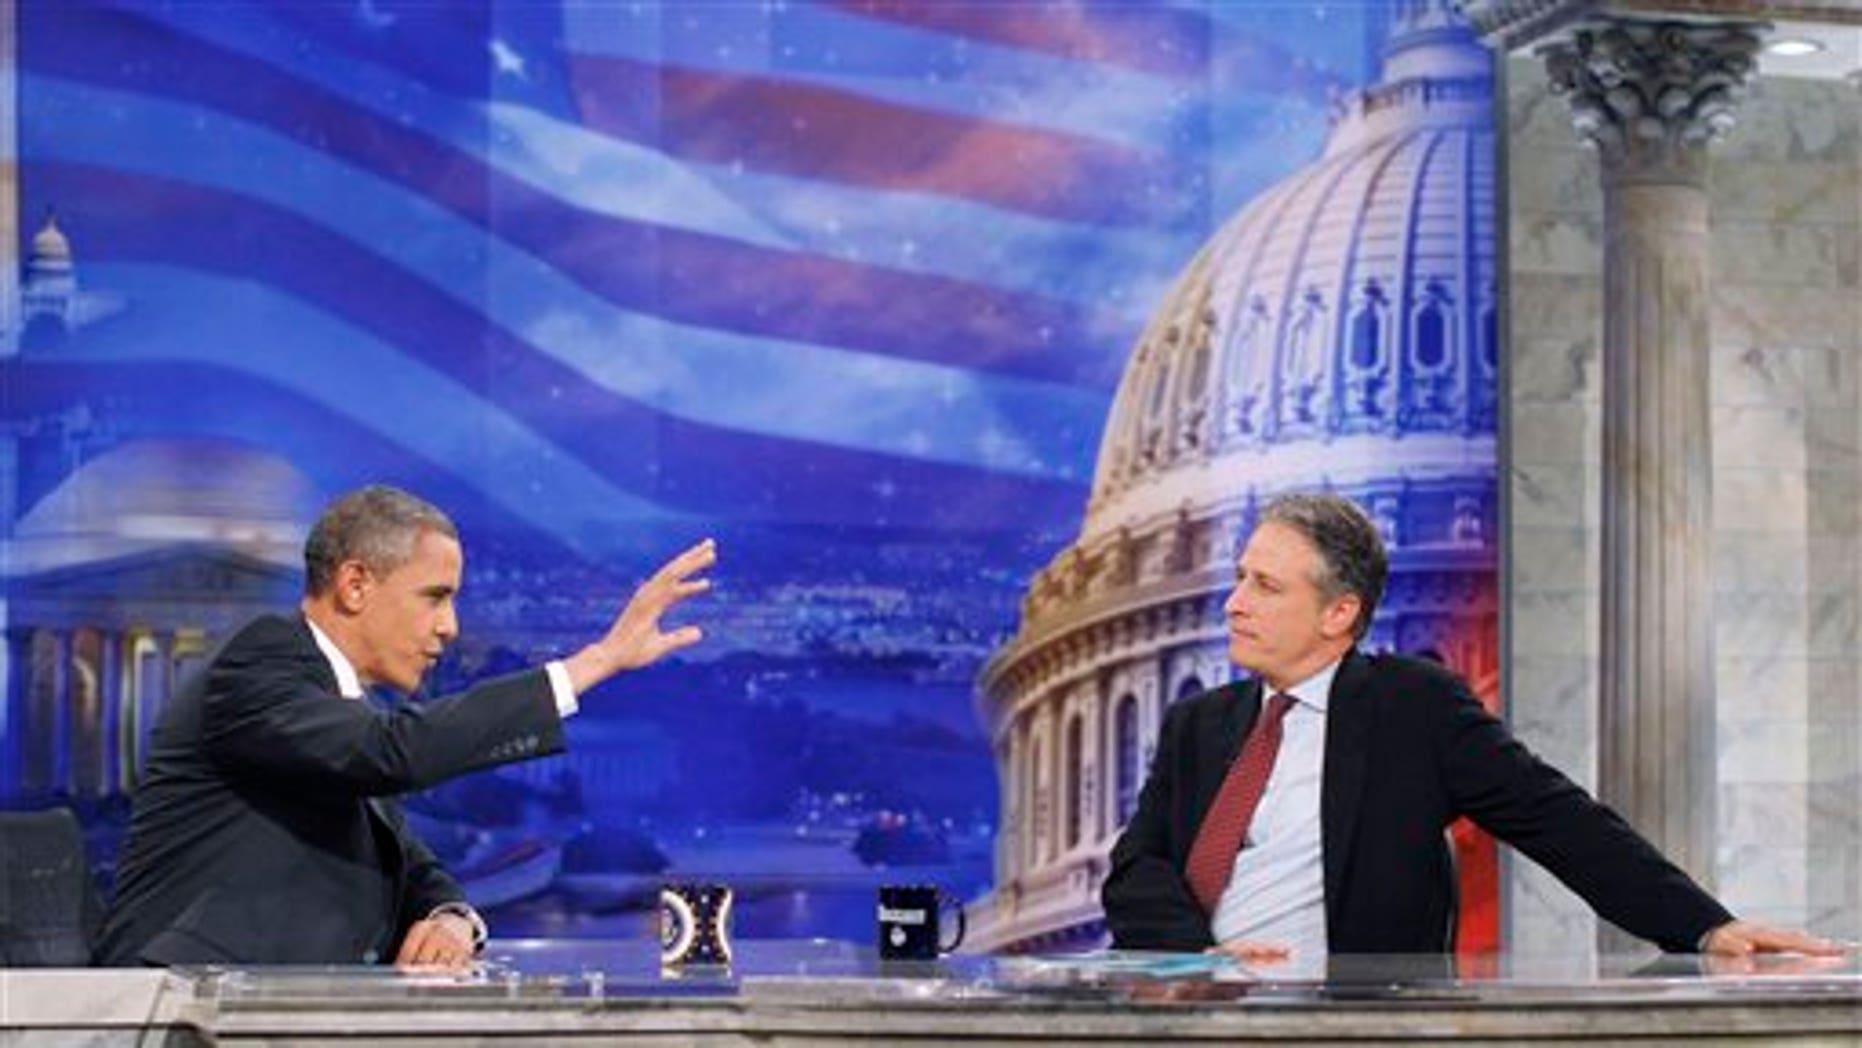 President Obama and 'The Daily Show' host Jon Stewart in Washington.